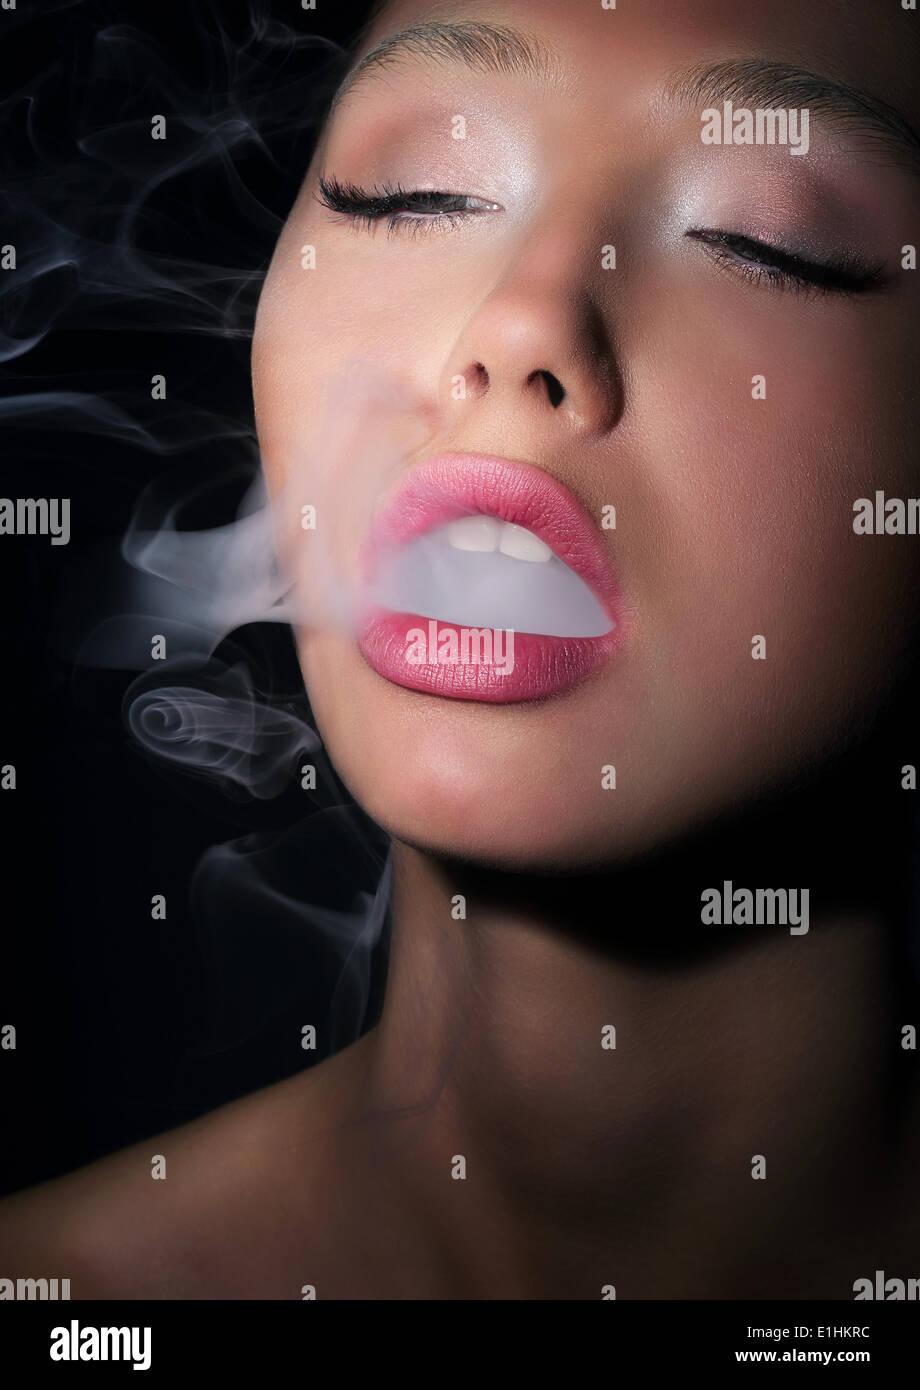 Dependence. Addiction. Woman Smoker Exhales Smoke of Cigarette - Stock Image